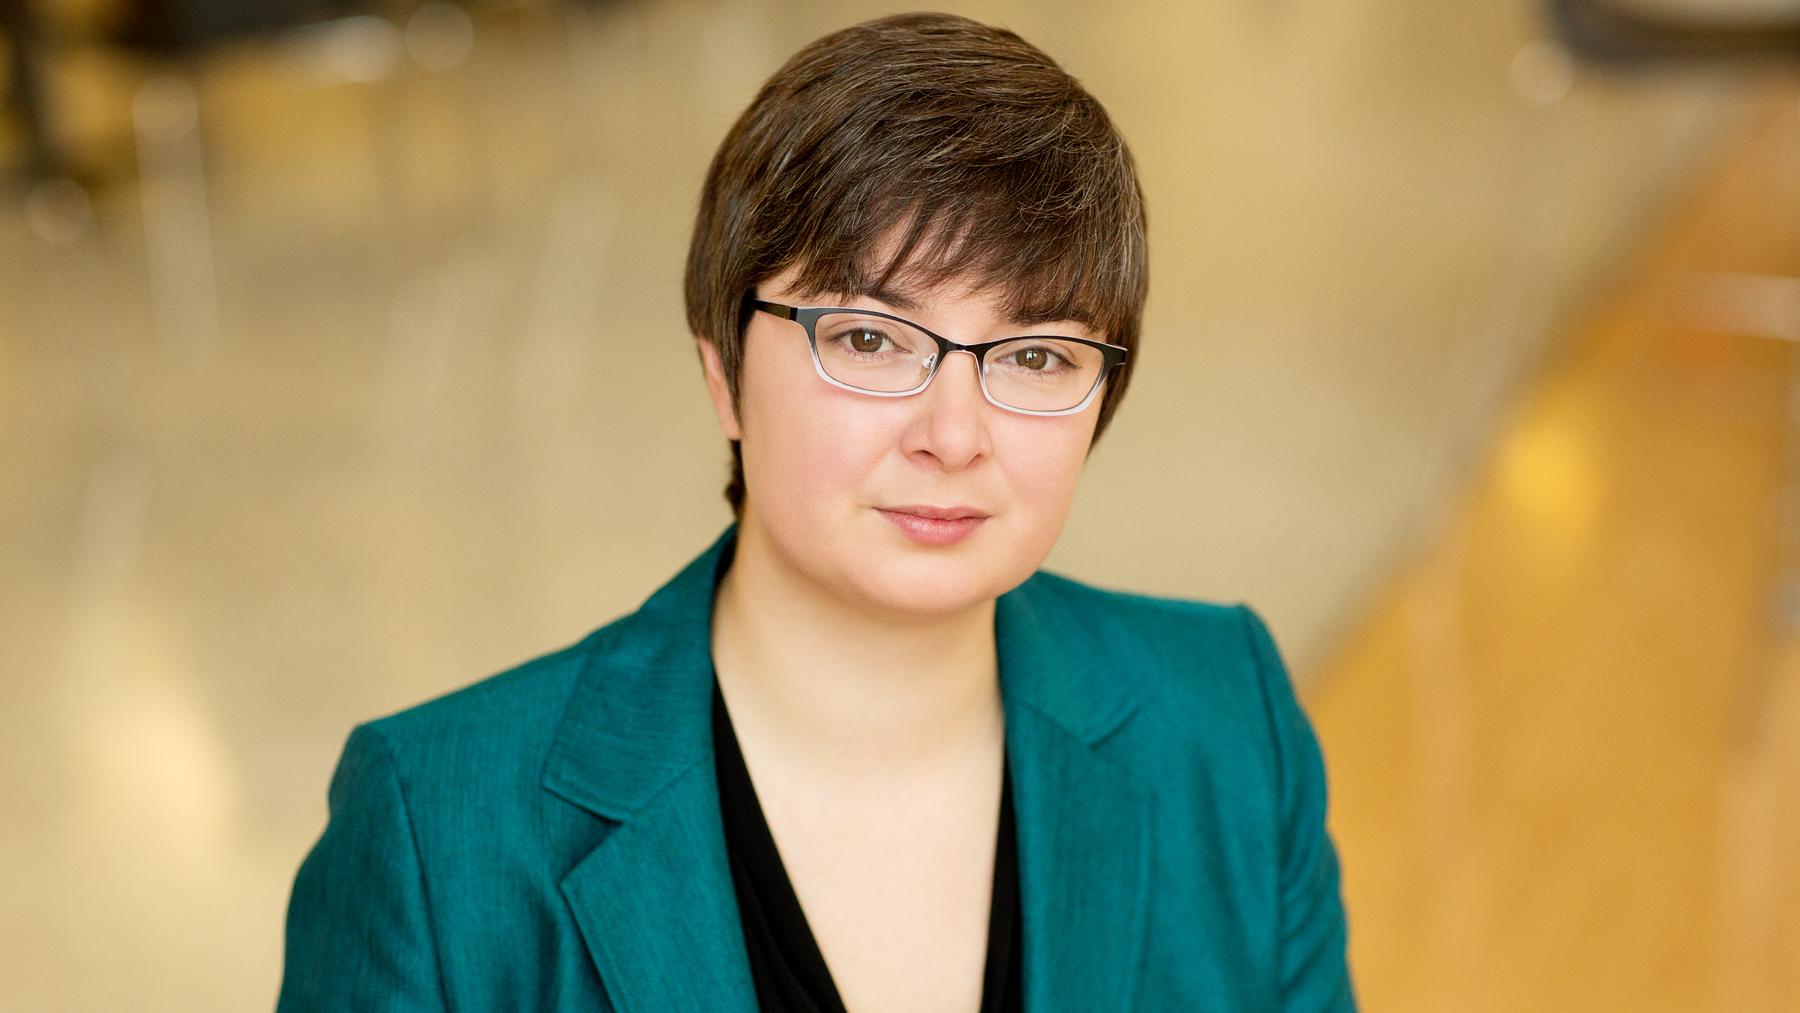 Illinois labor economist Eliza Forsythe. Photo by L. B. Stauffer